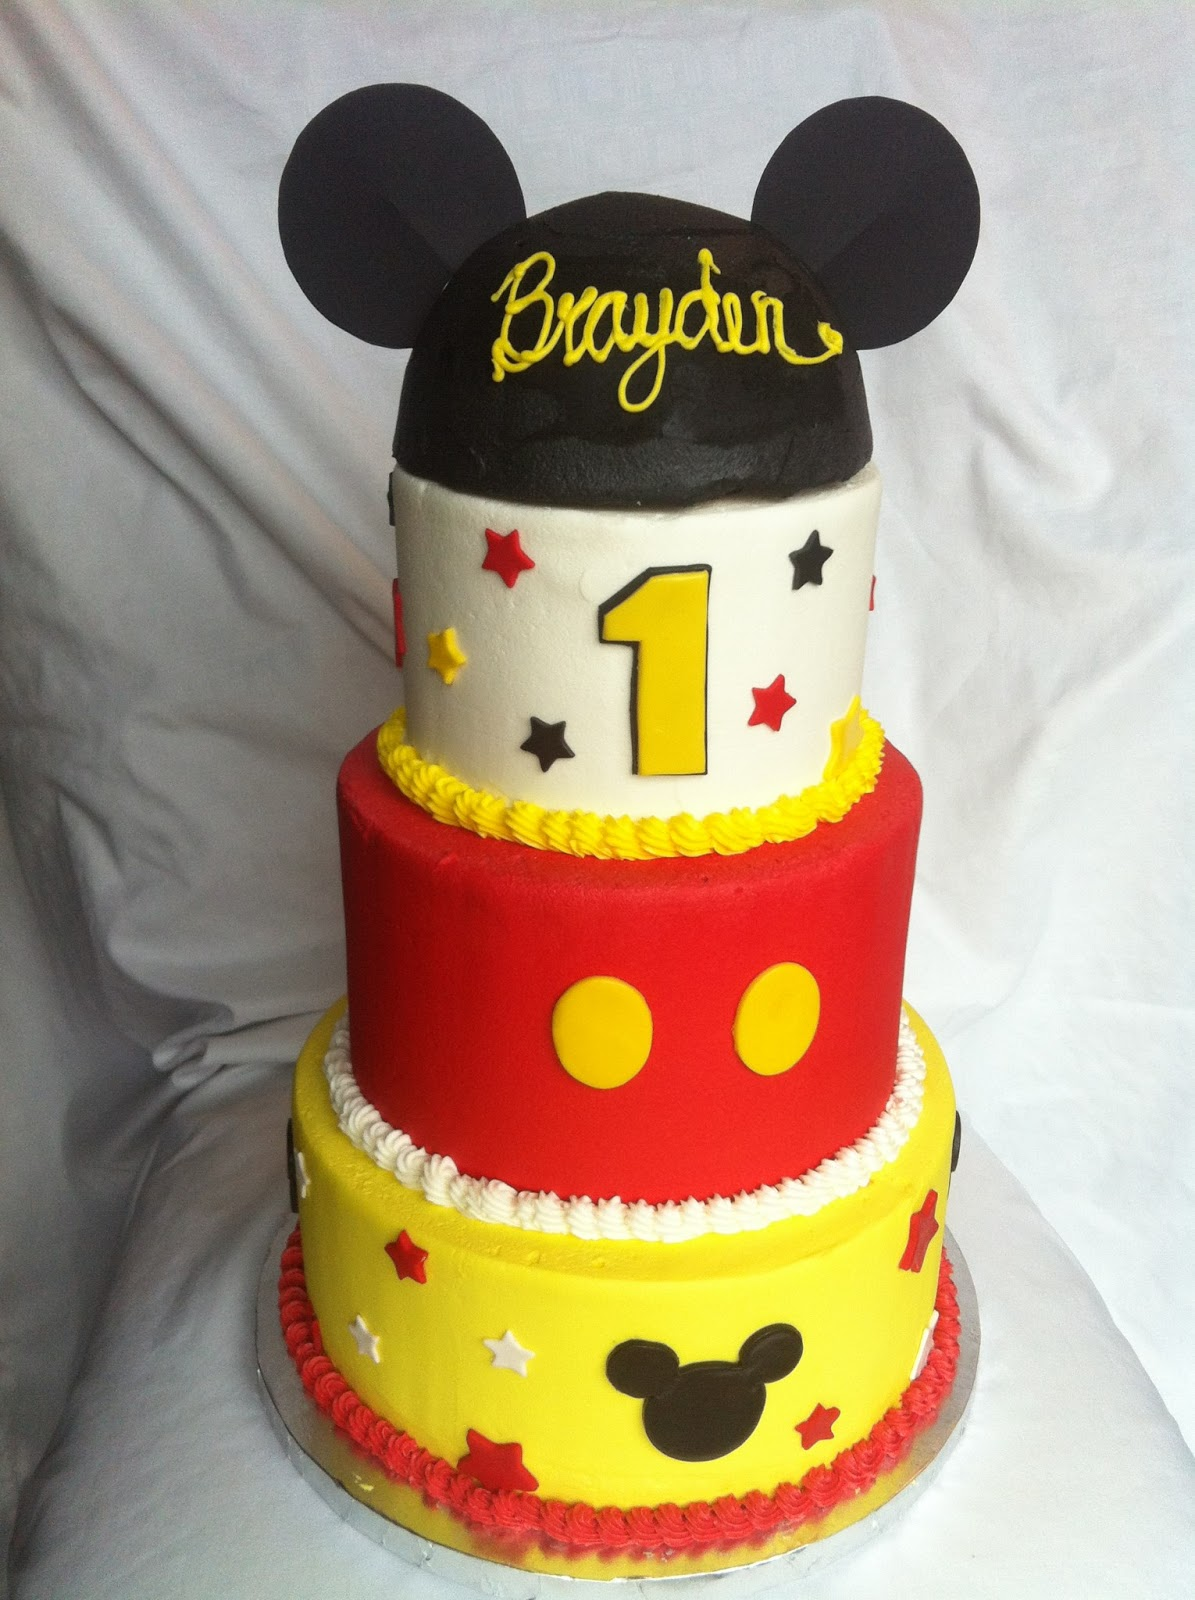 Simply Delicious Cakes Blogspot